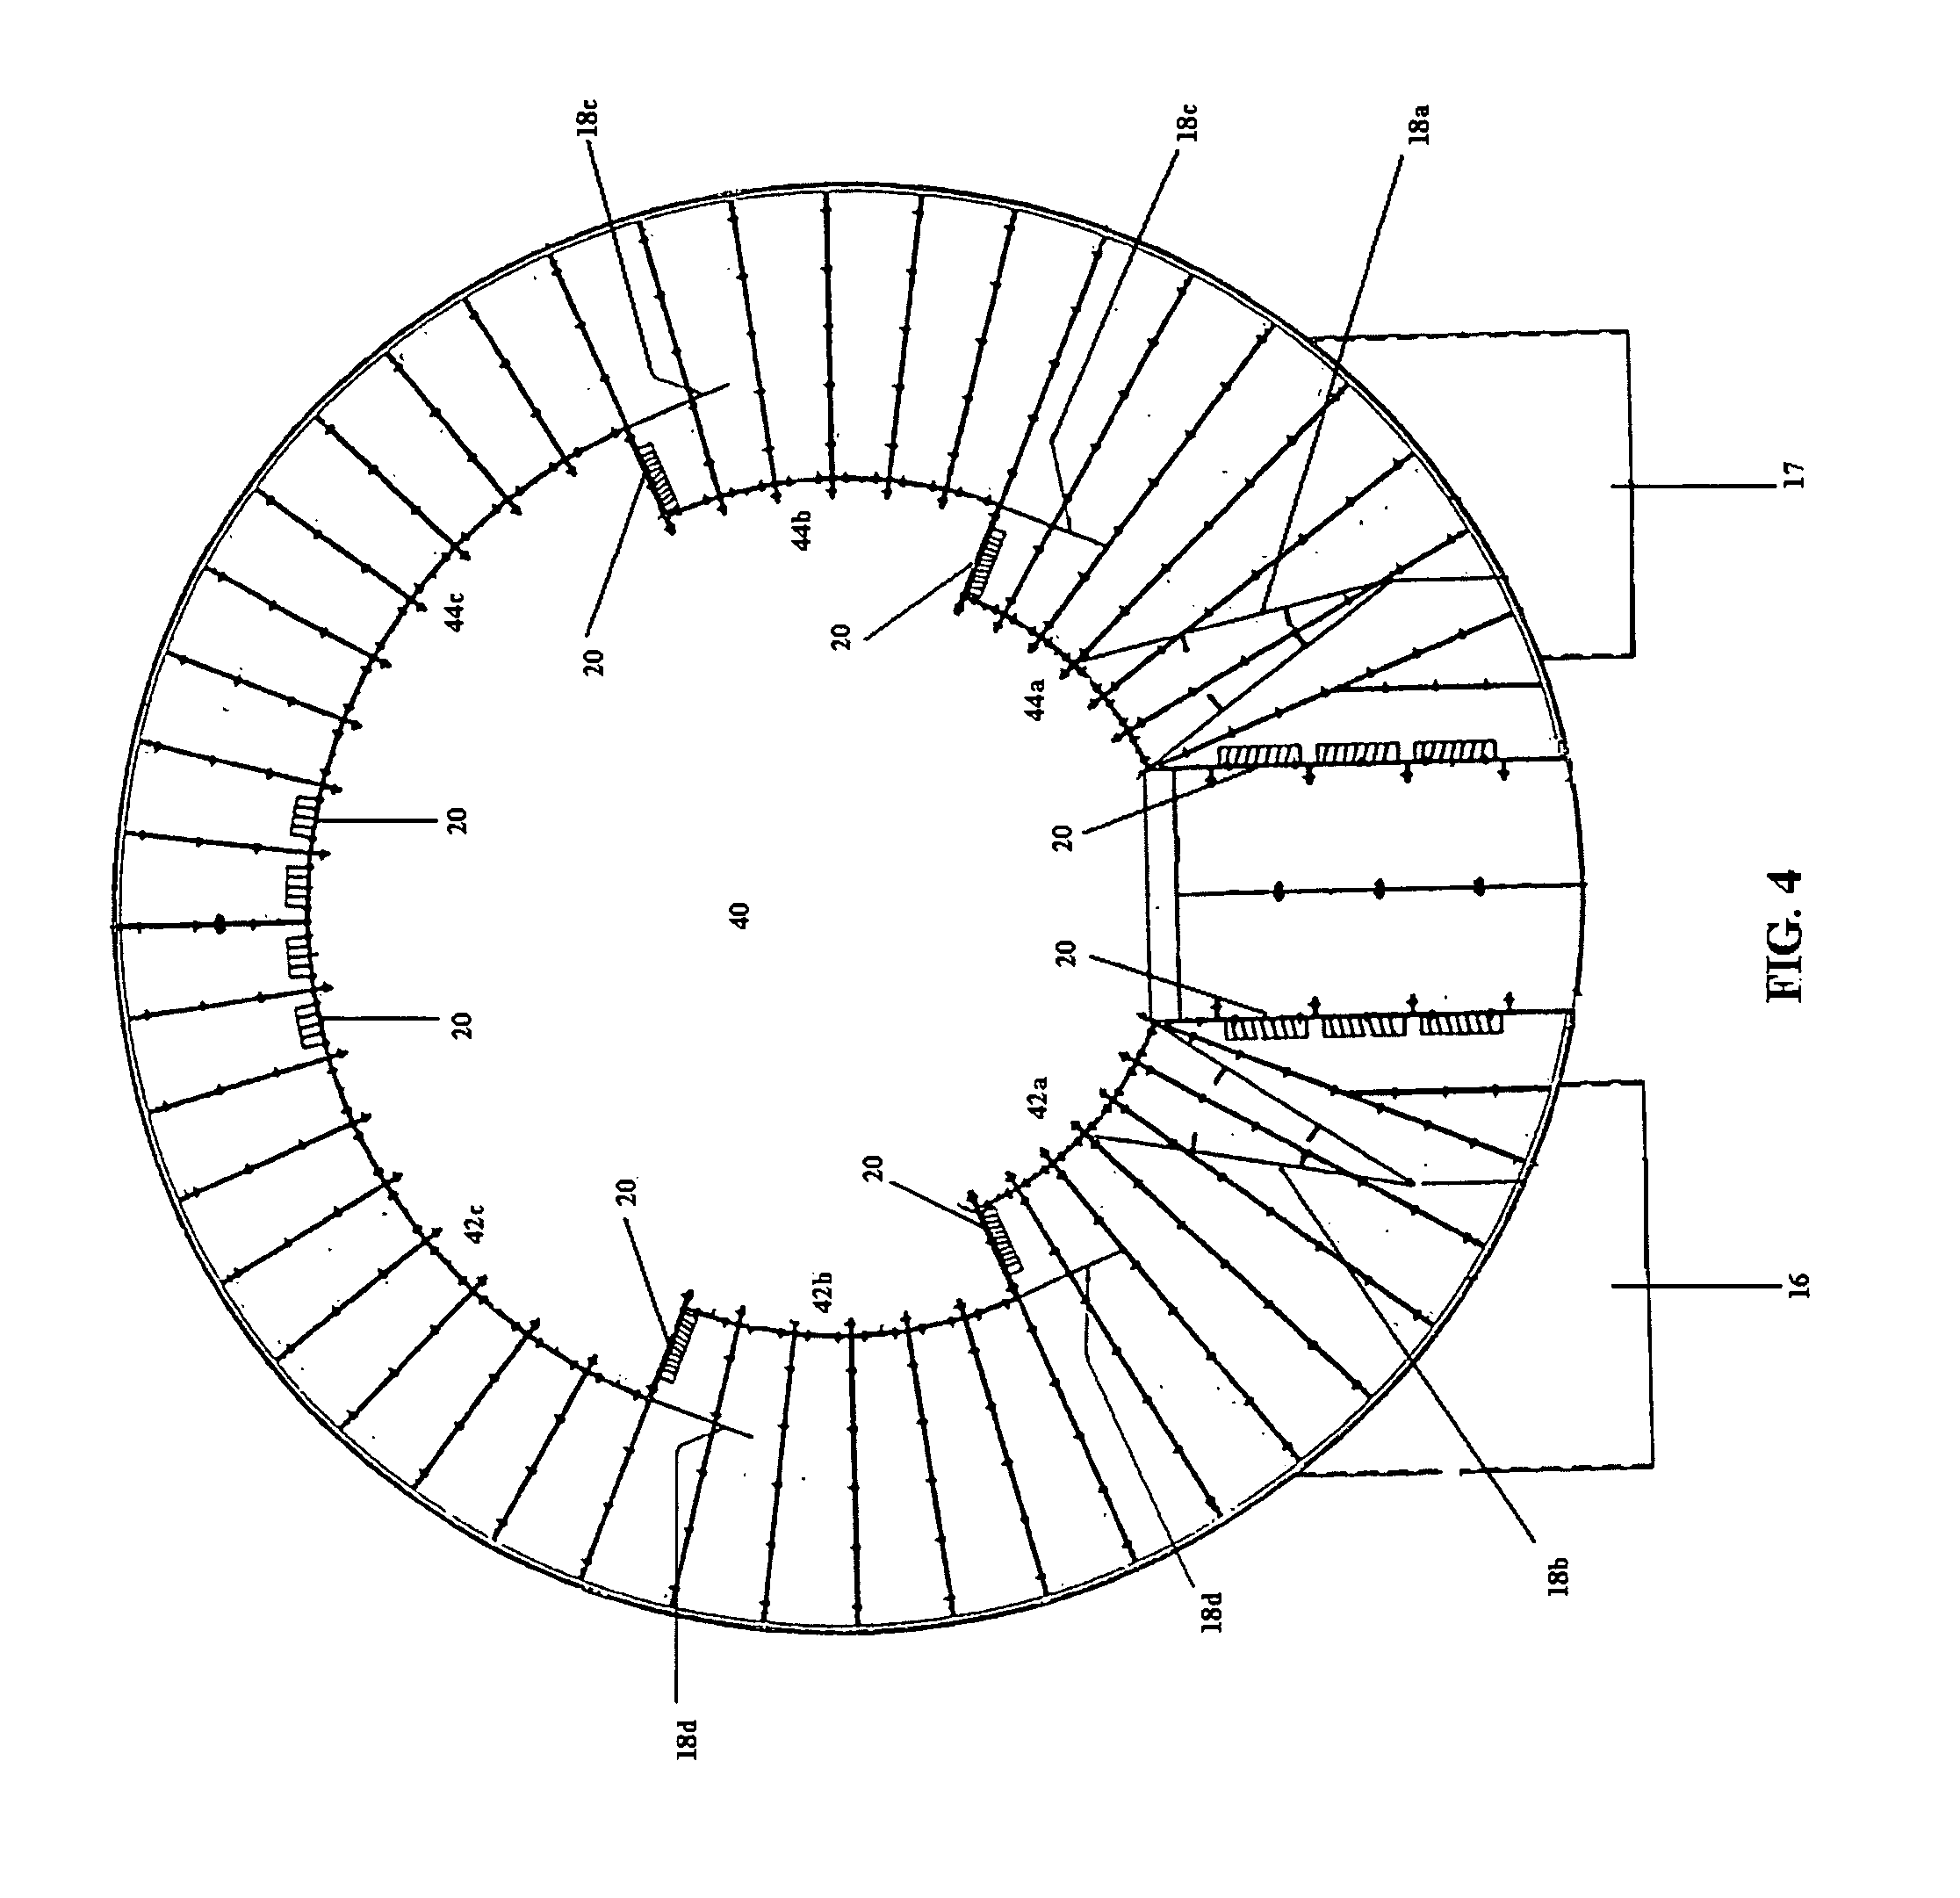 worksheet Global Wind Patterns Worksheet patent us7744067 three phase vapor distributor google patents drawing